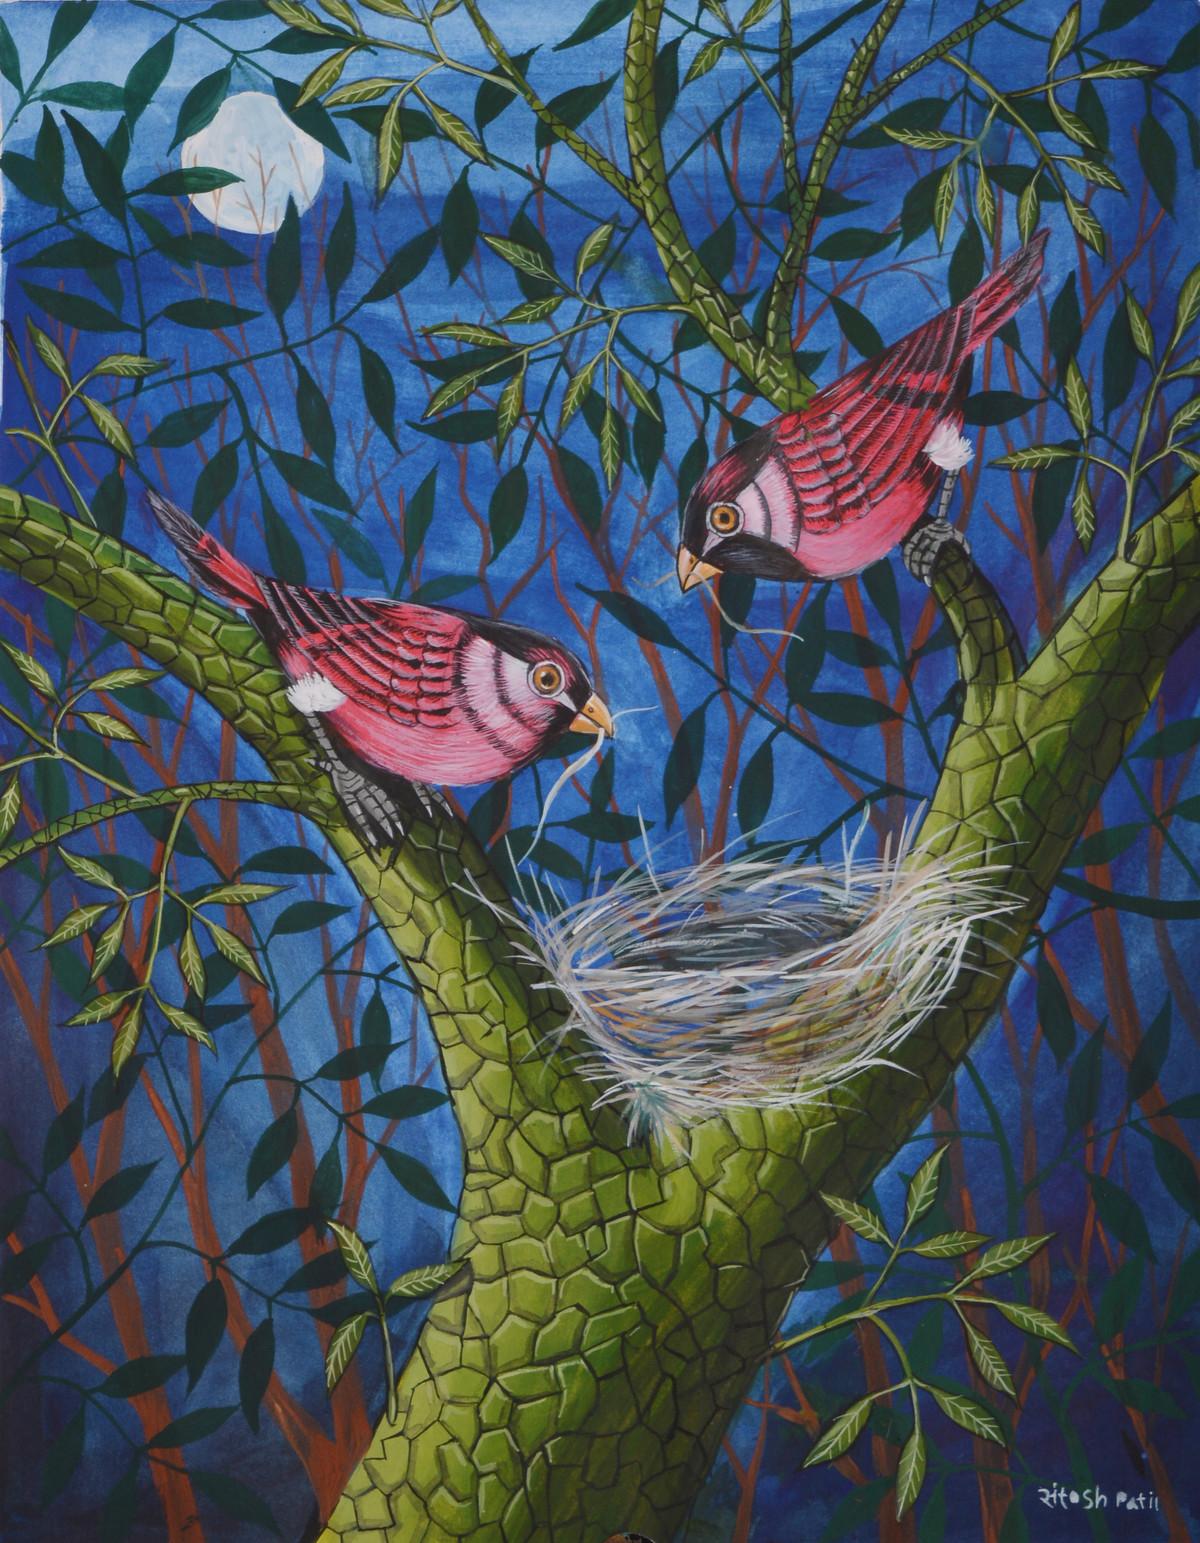 Birds Painting 39 by santosh patil, Decorative Painting, Watercolor on Paper, Blue color